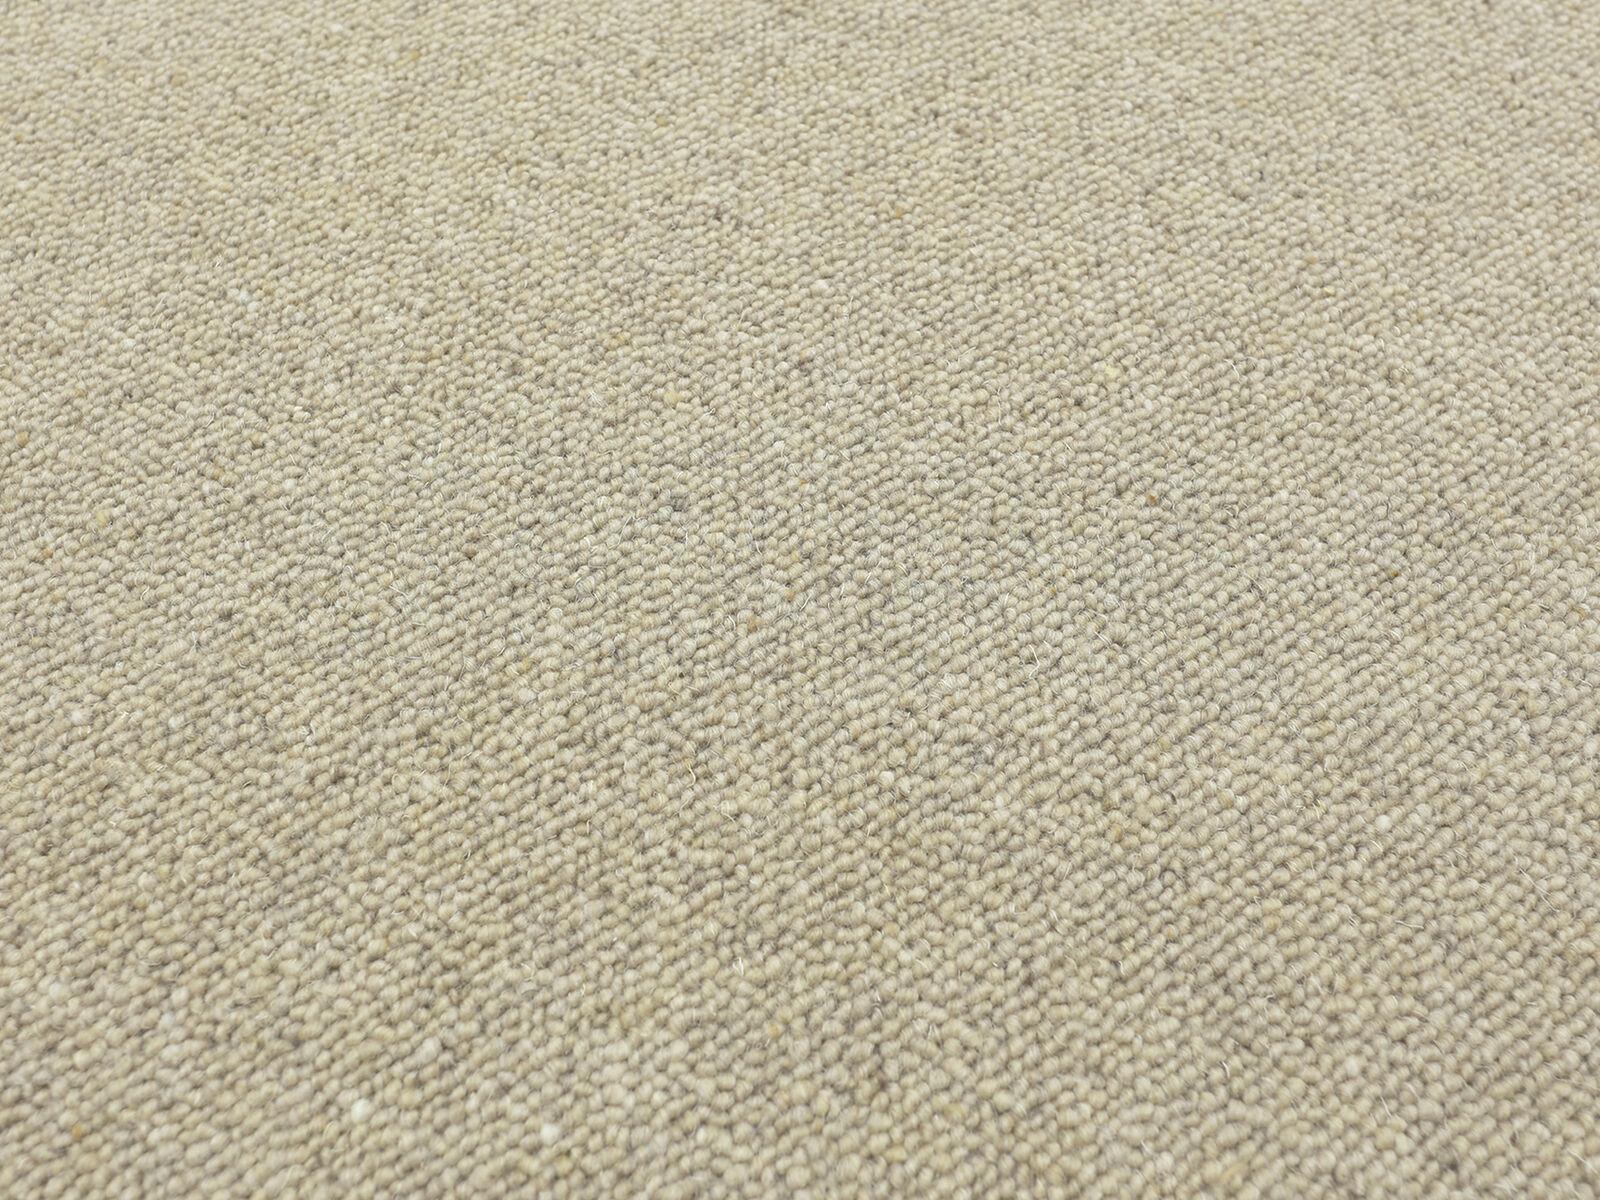 Tango Kiesel HEVO ® Teppich   Teppichläufer Teppichläufer Teppichläufer 120x340 cm 100% Wolle 298781